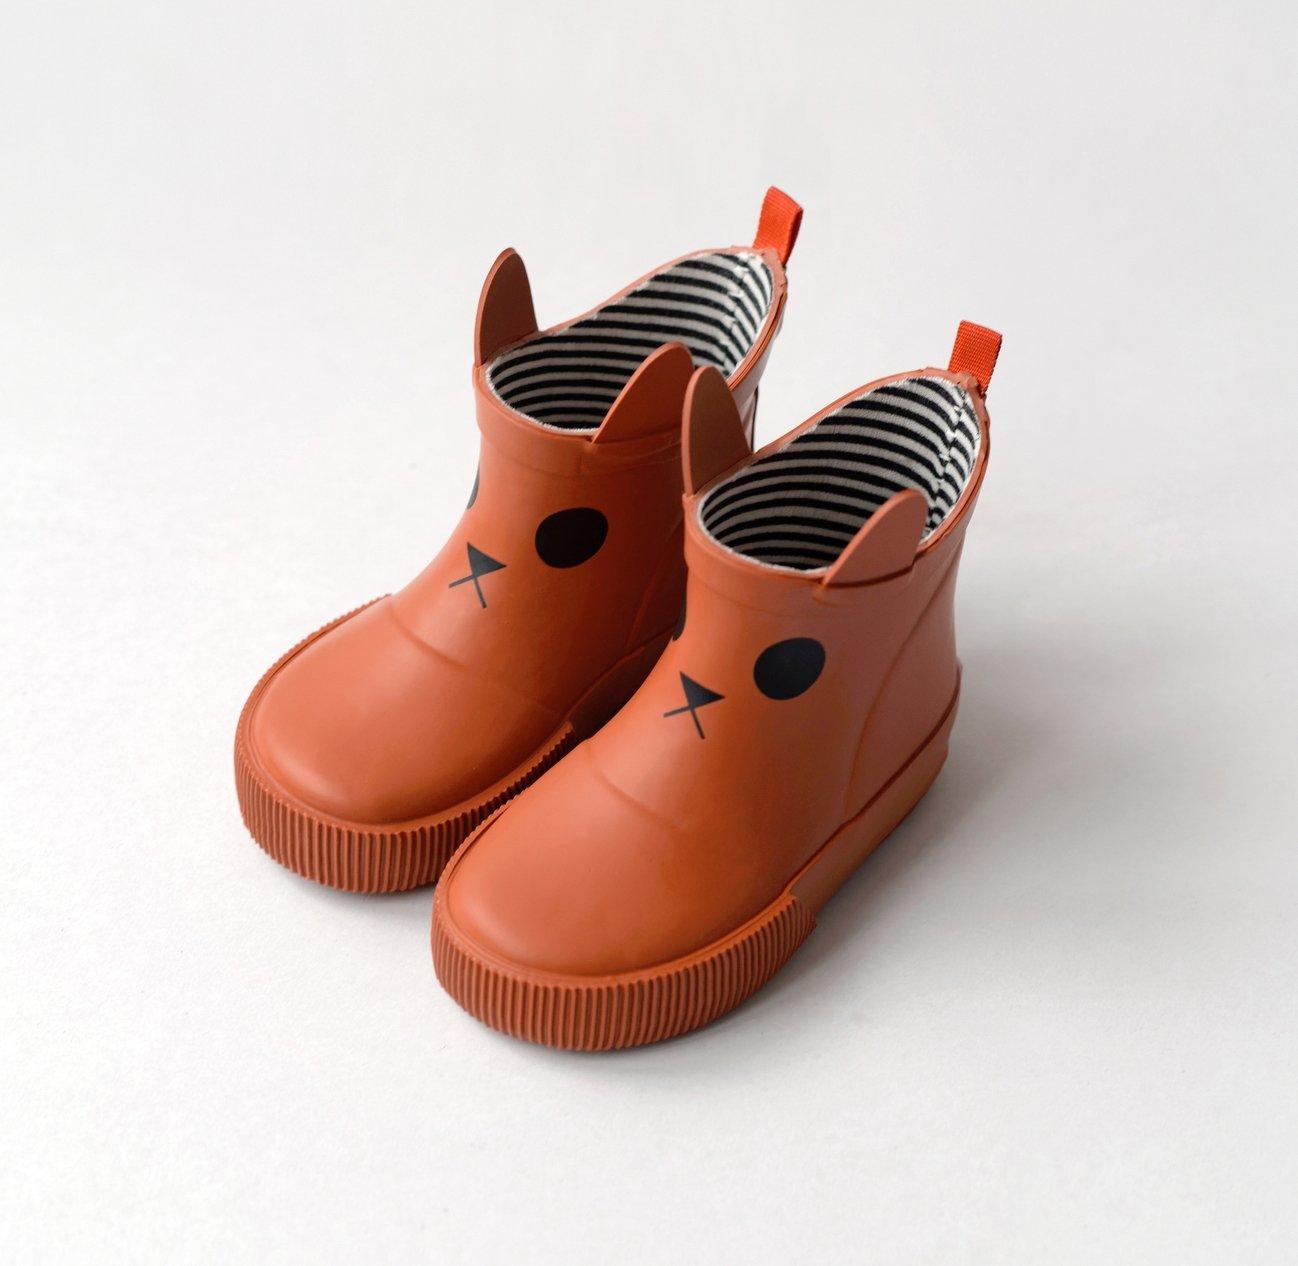 Kitty Rain Boots - Orange by Boxbo